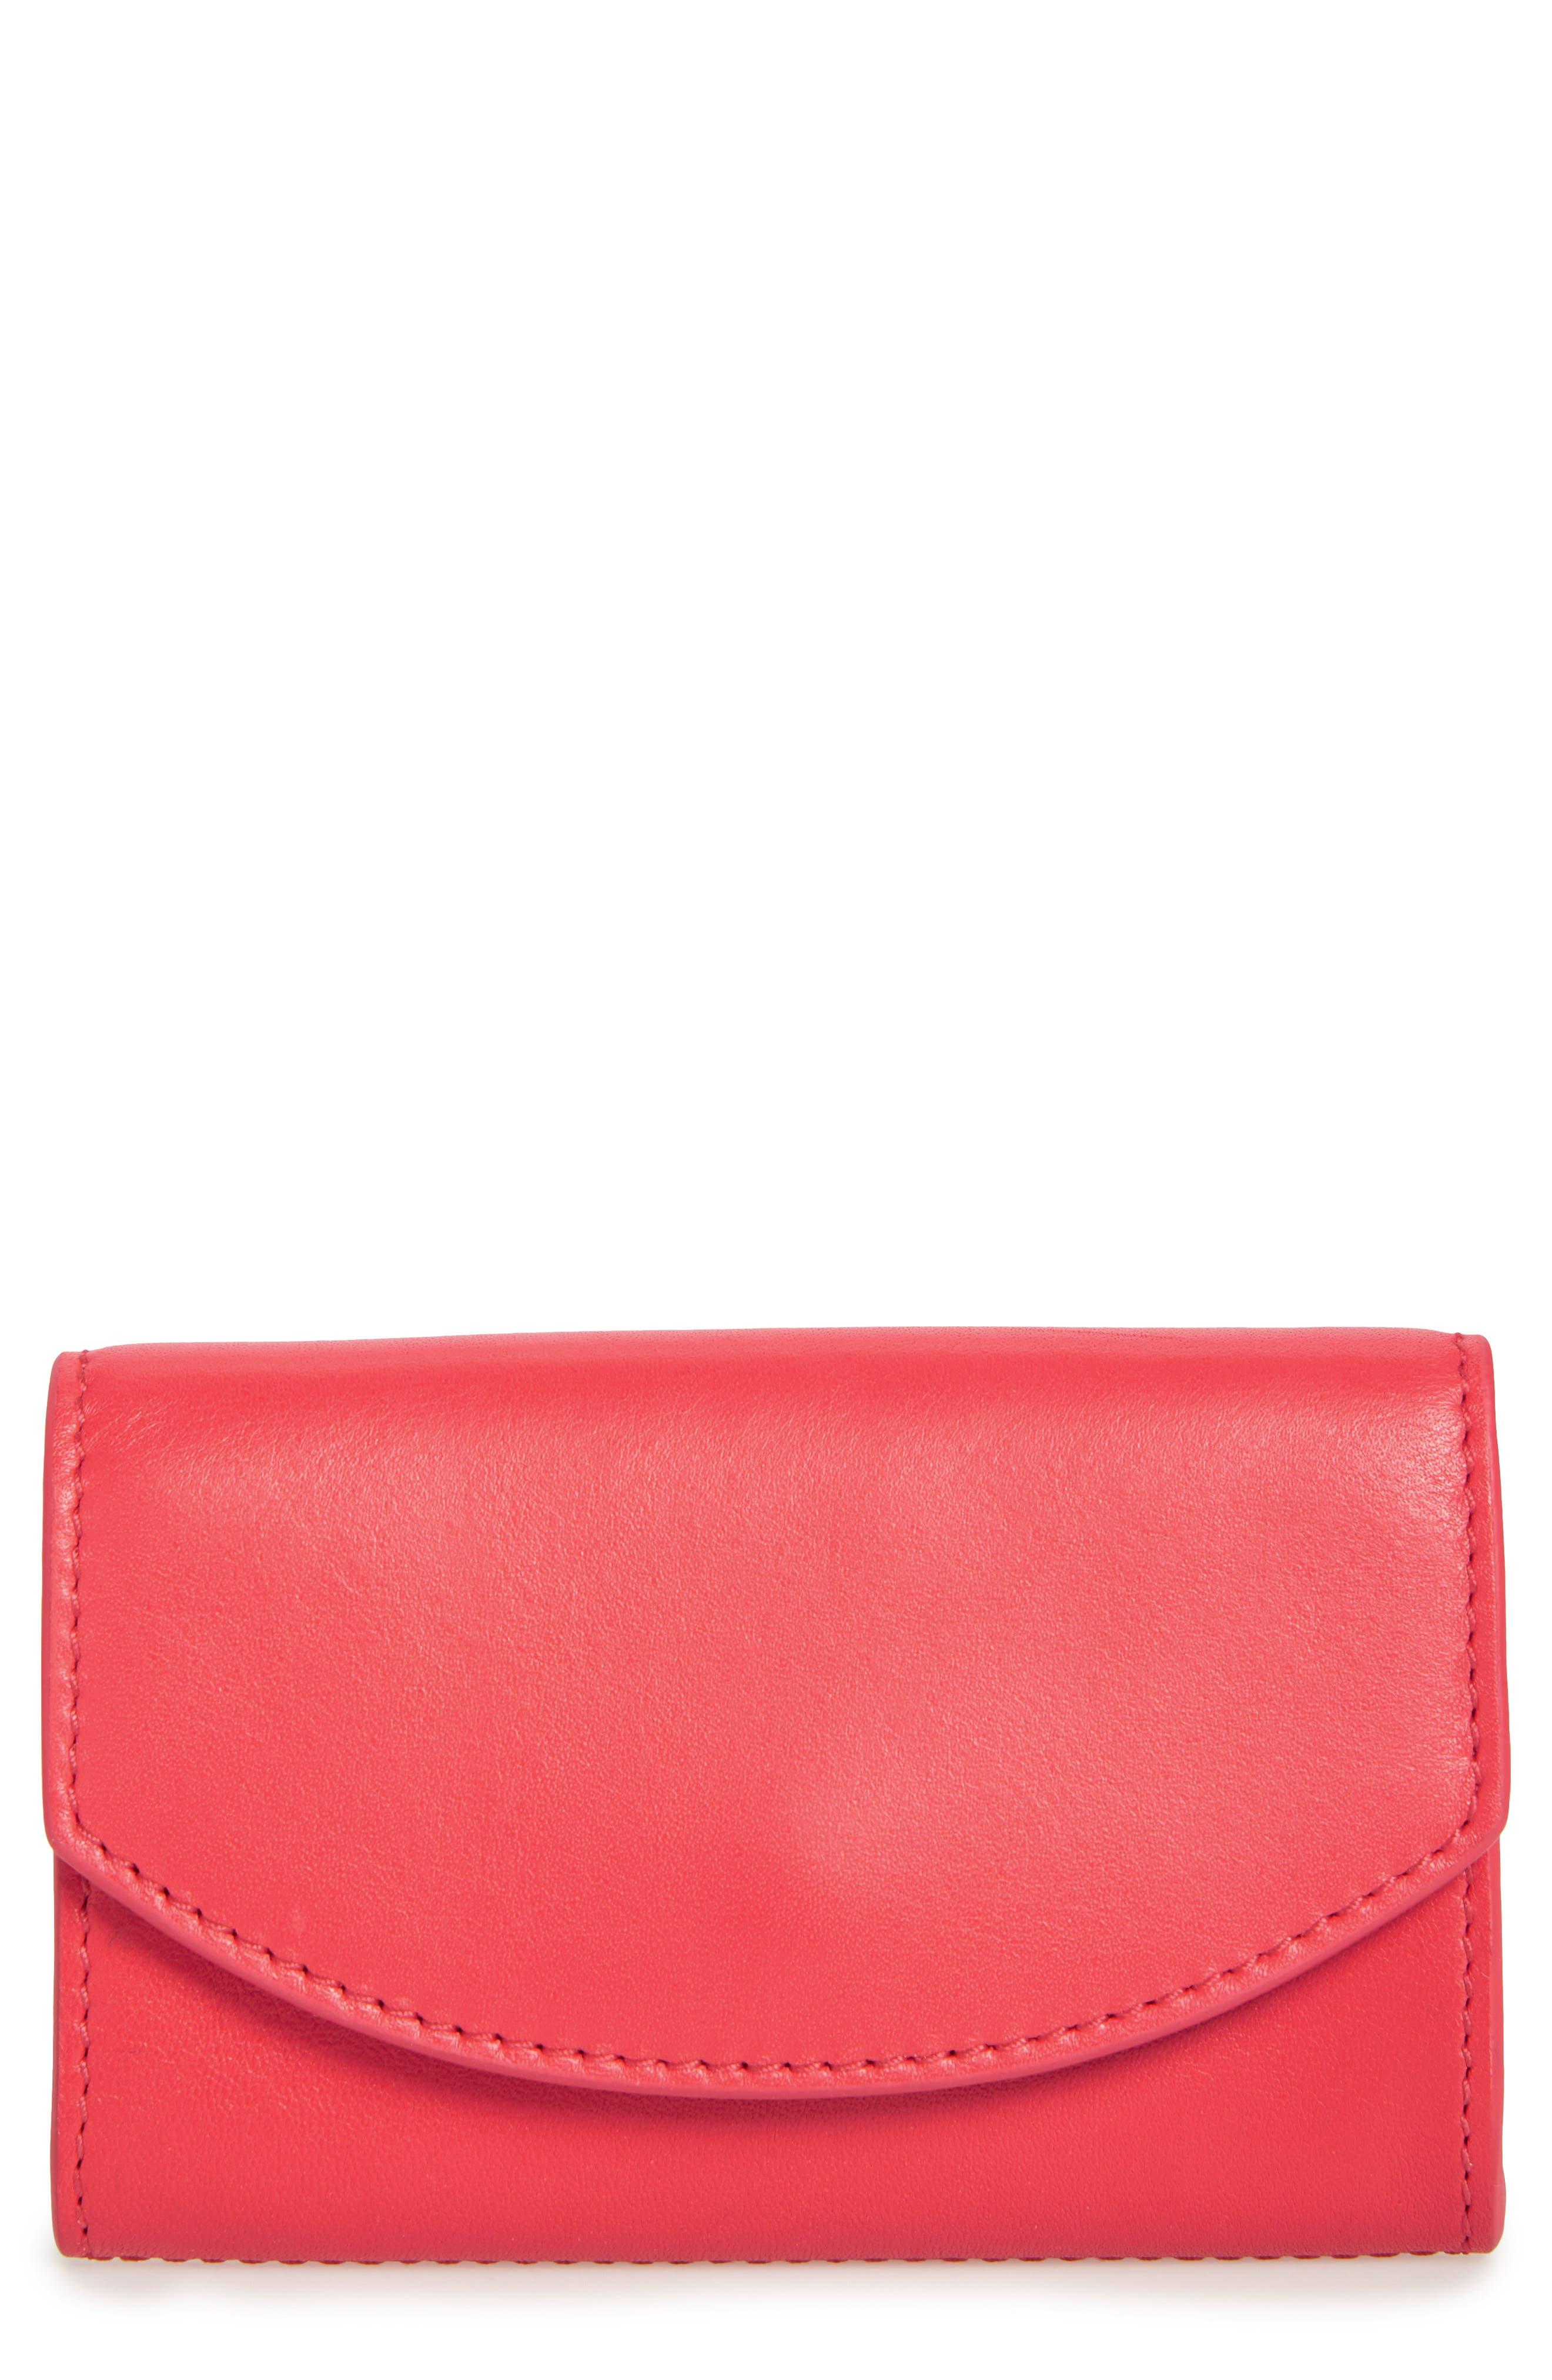 Leather Card Case,                             Main thumbnail 1, color,                             Lotus